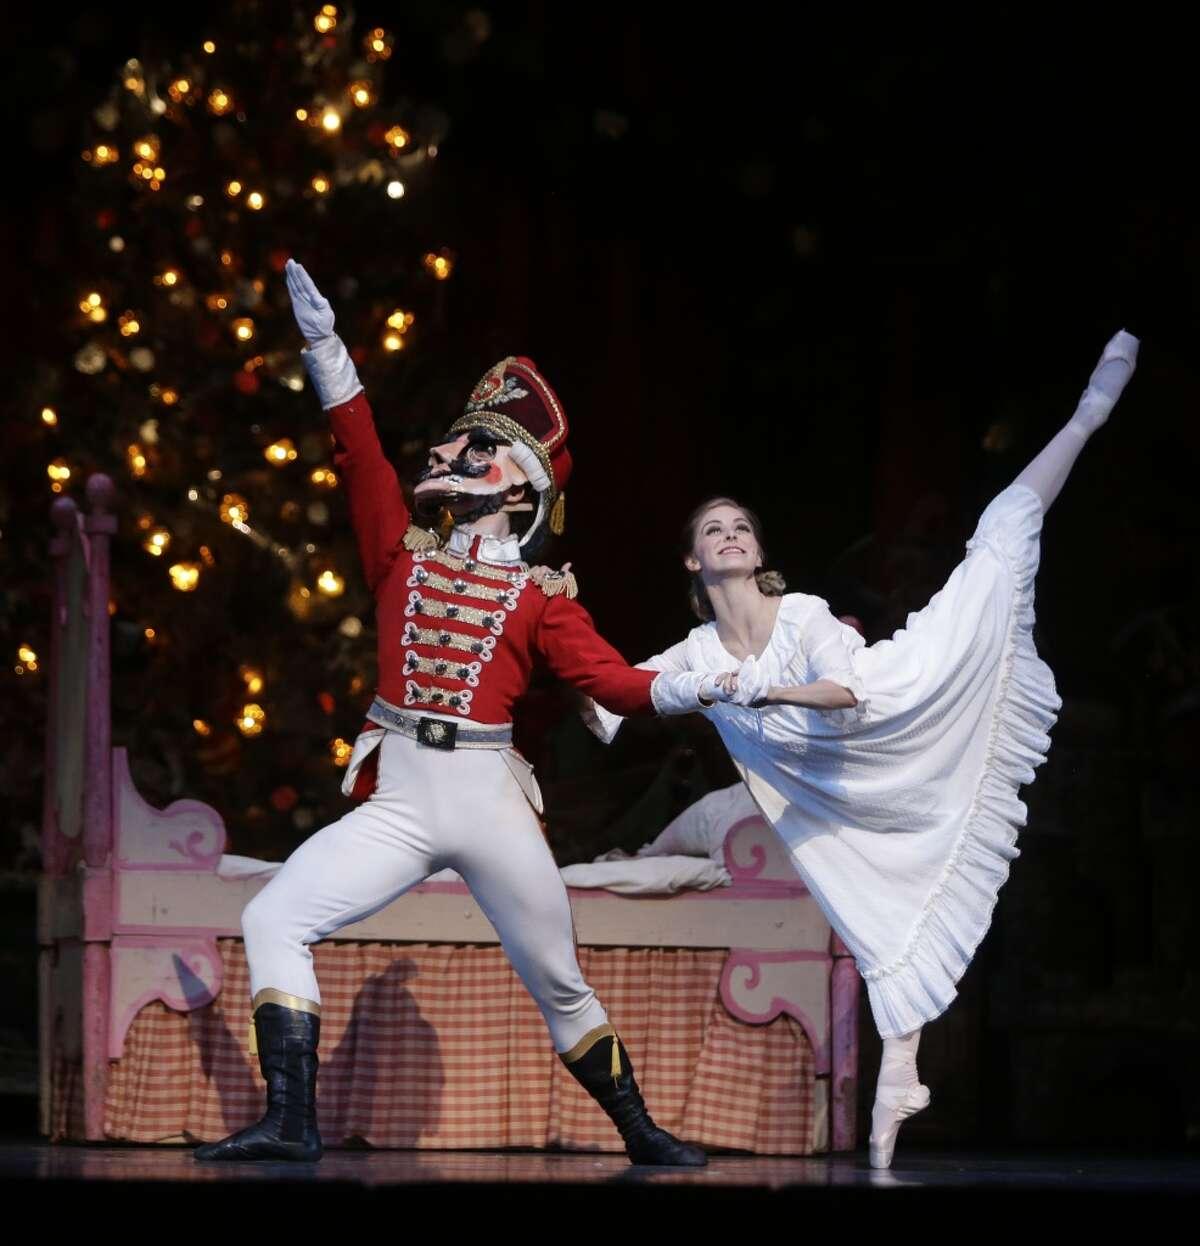 9: Dance of the Sugar Plum Fairy